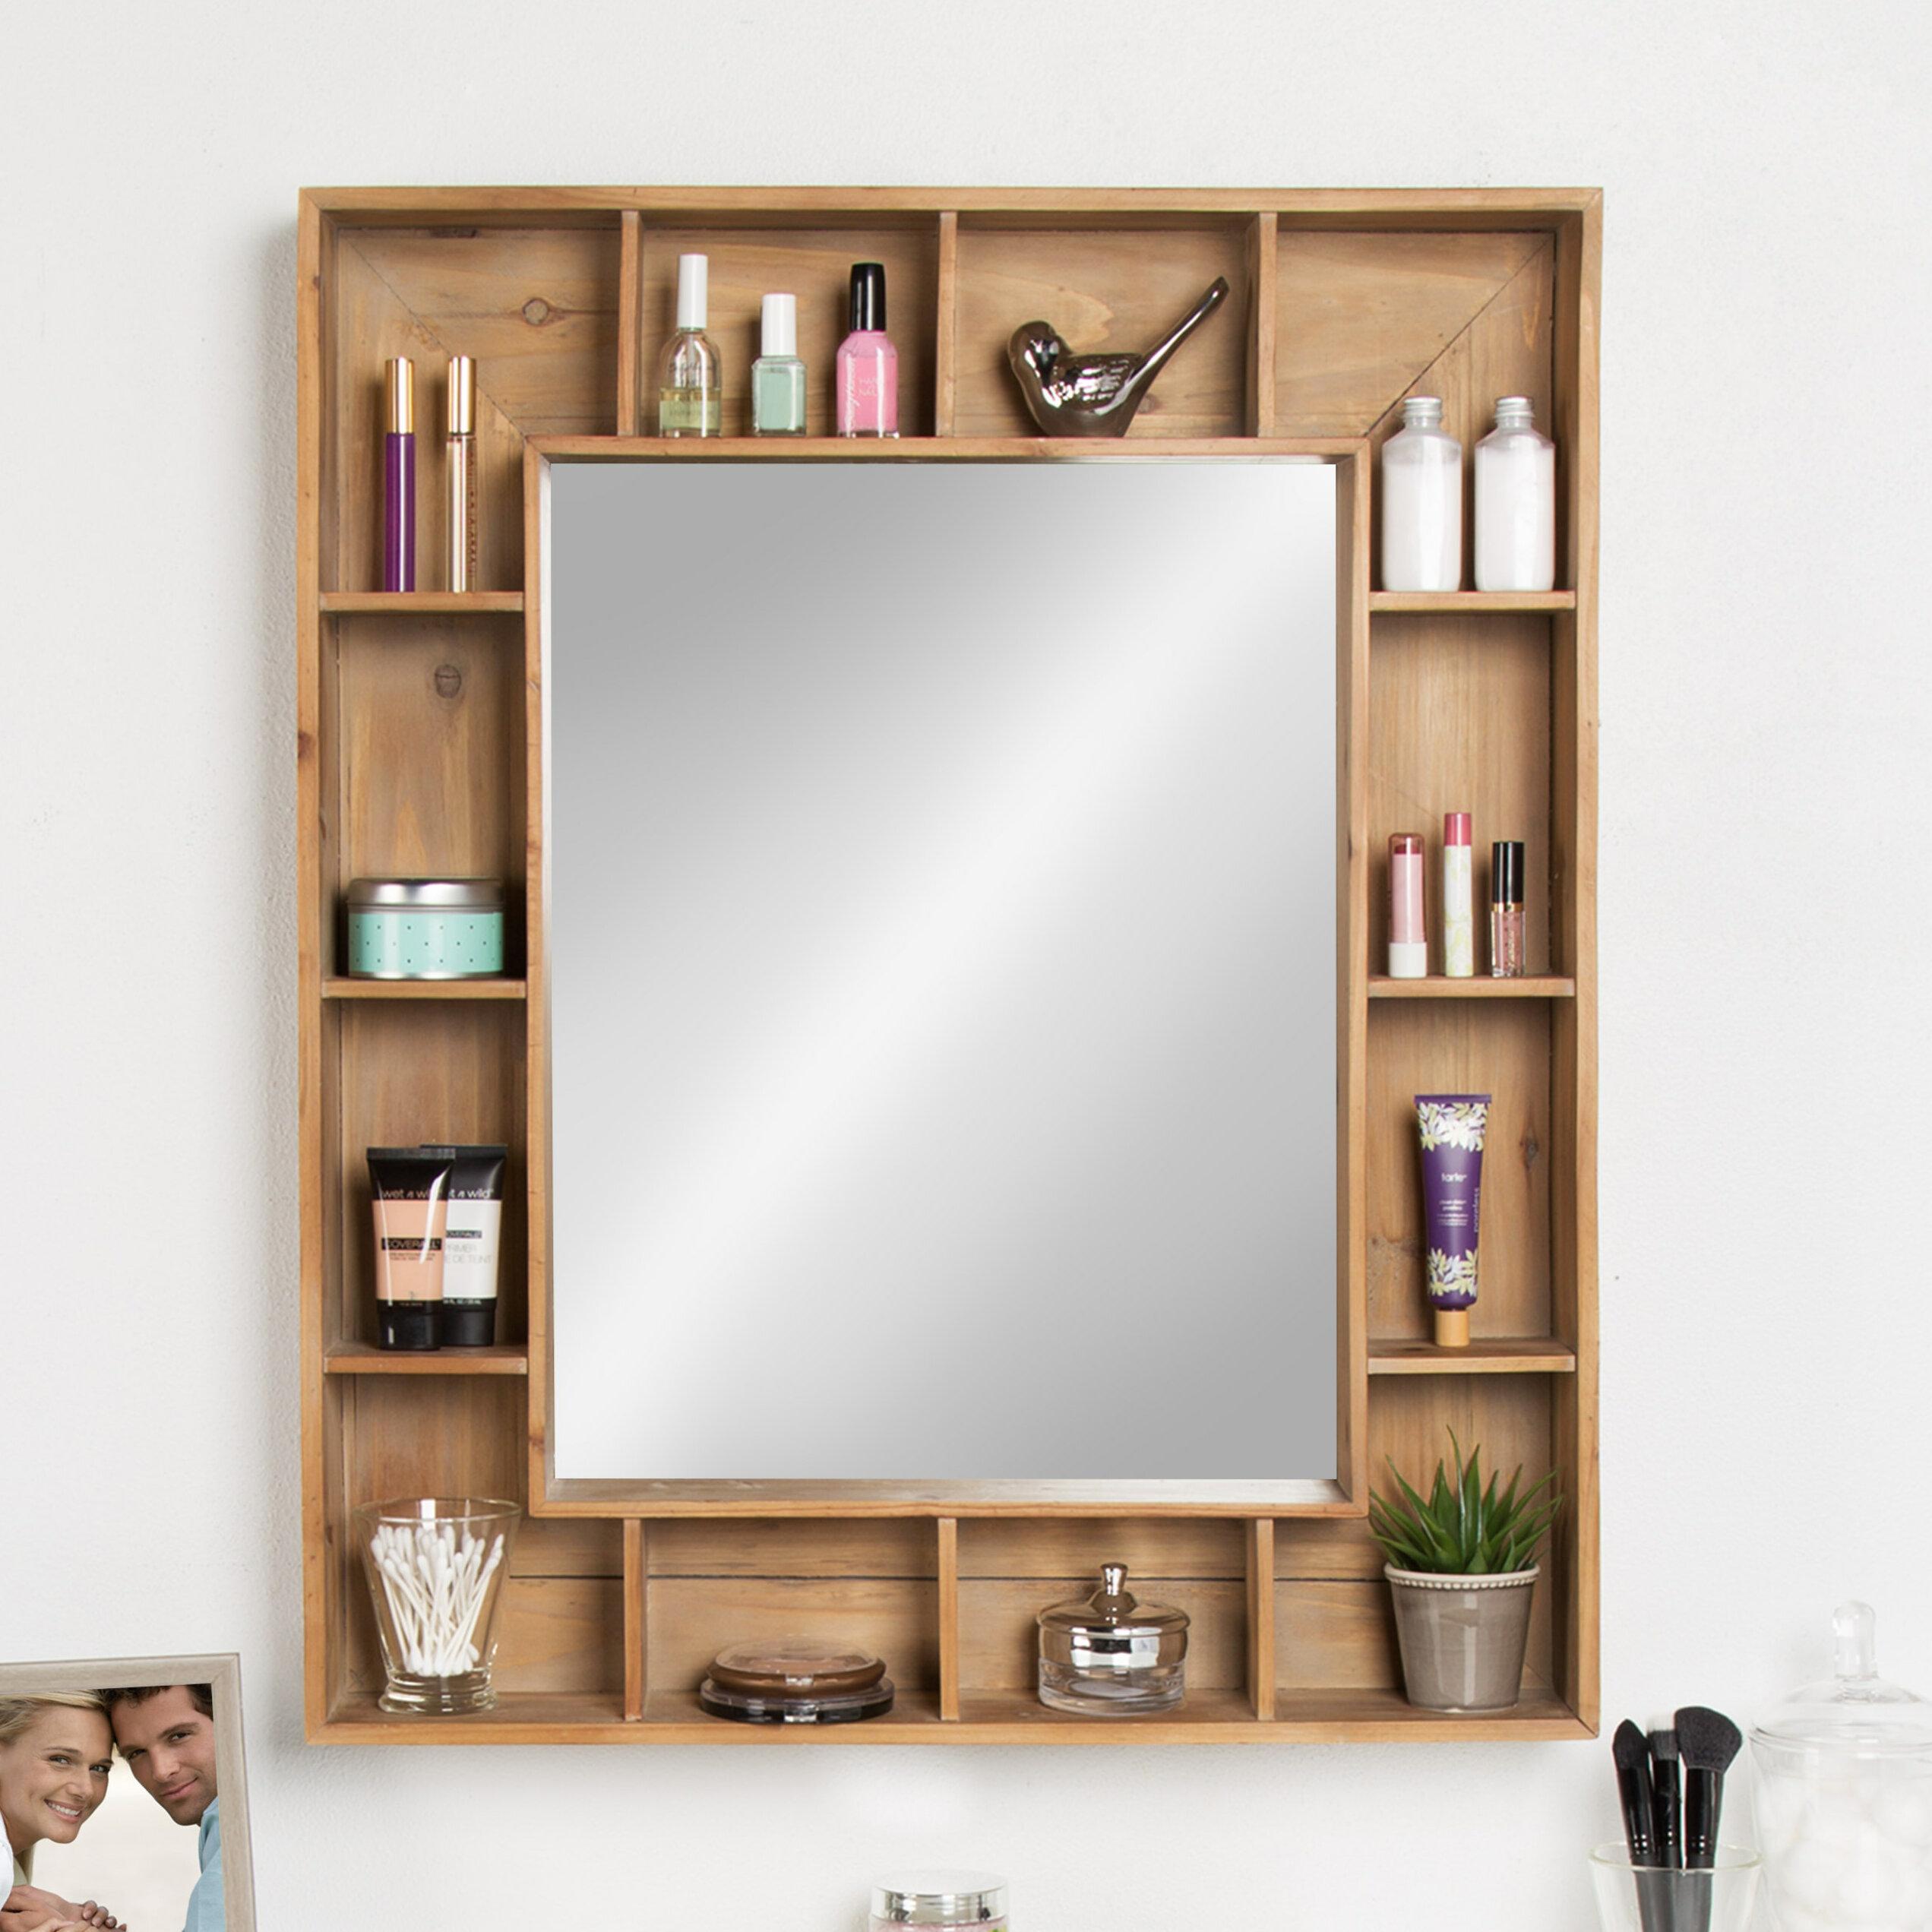 Loon Peak Gretel Rustic Wood Cubby Framed Wall Storage Accent Mirror ...